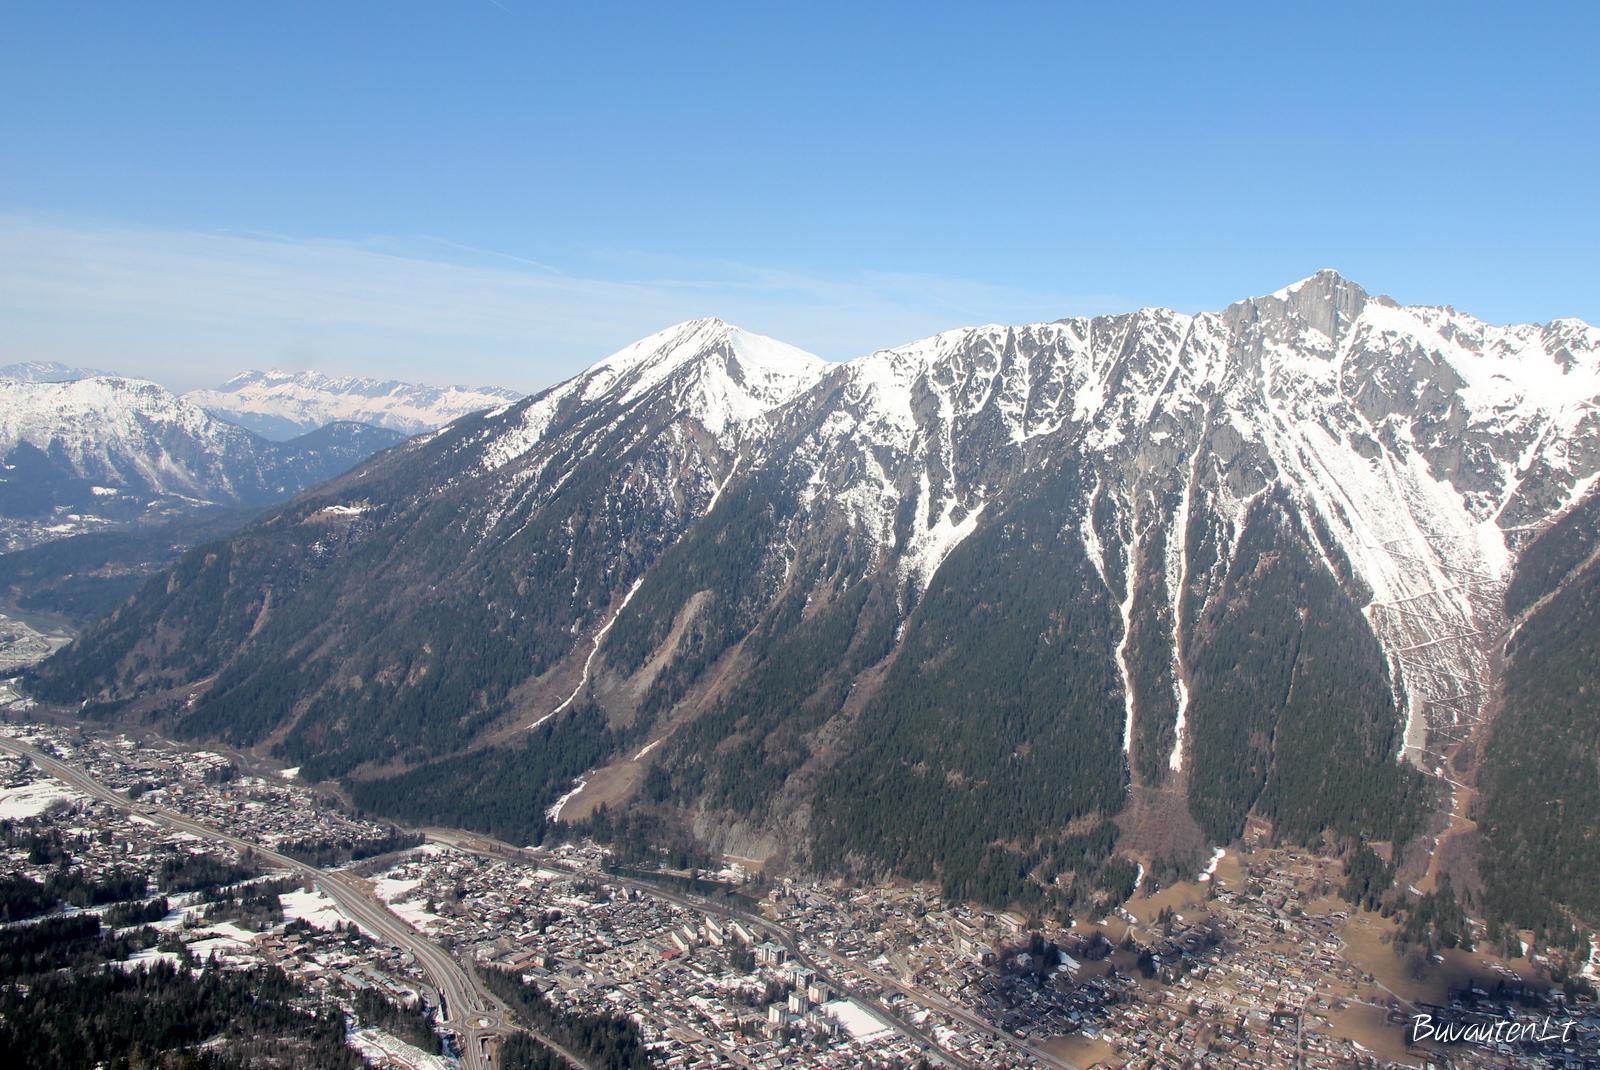 Šamoni iš viršaus kylant į Aiguille du Midi